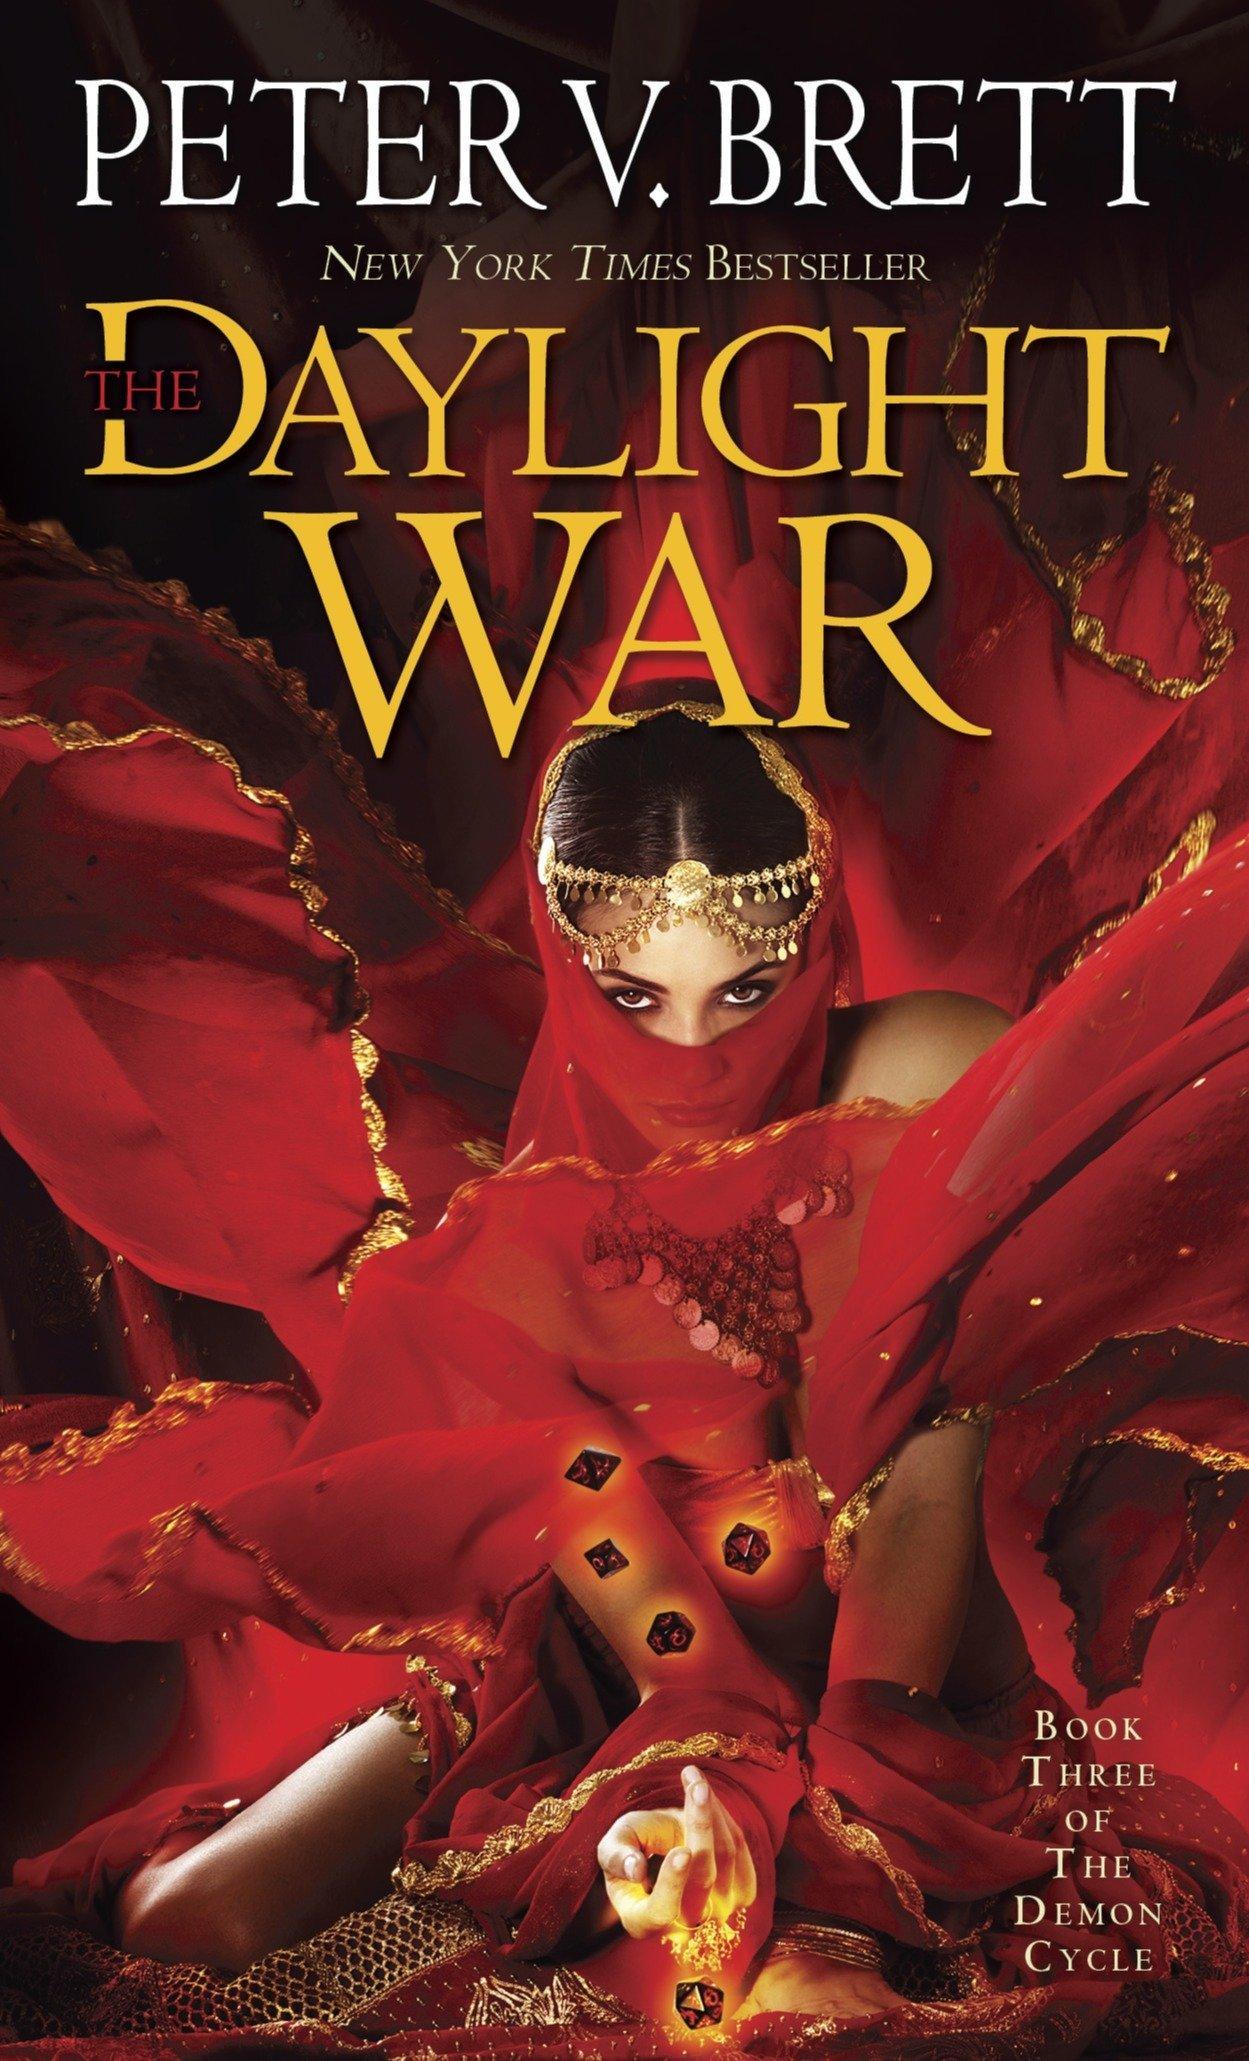 Daylight War Three Demon Cycle